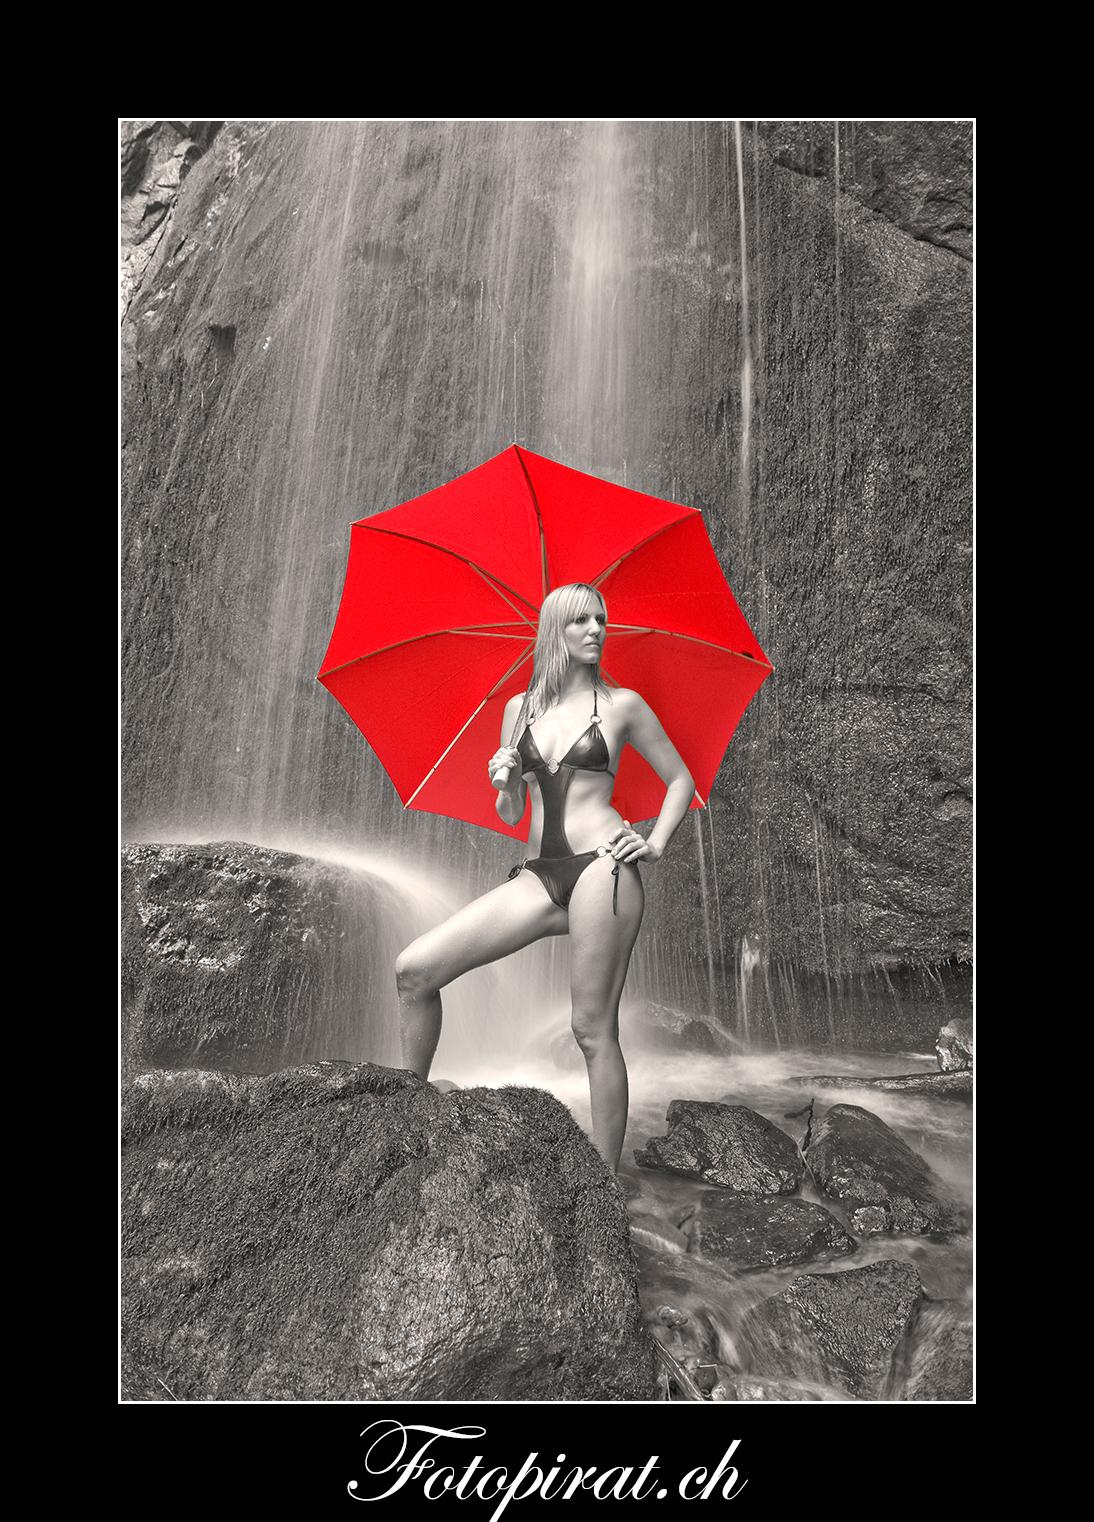 Fotoshooting, outdoor, blondes Fotomodel, Modelagentur, Wasserfallshooting, Monokini. eyecatcher